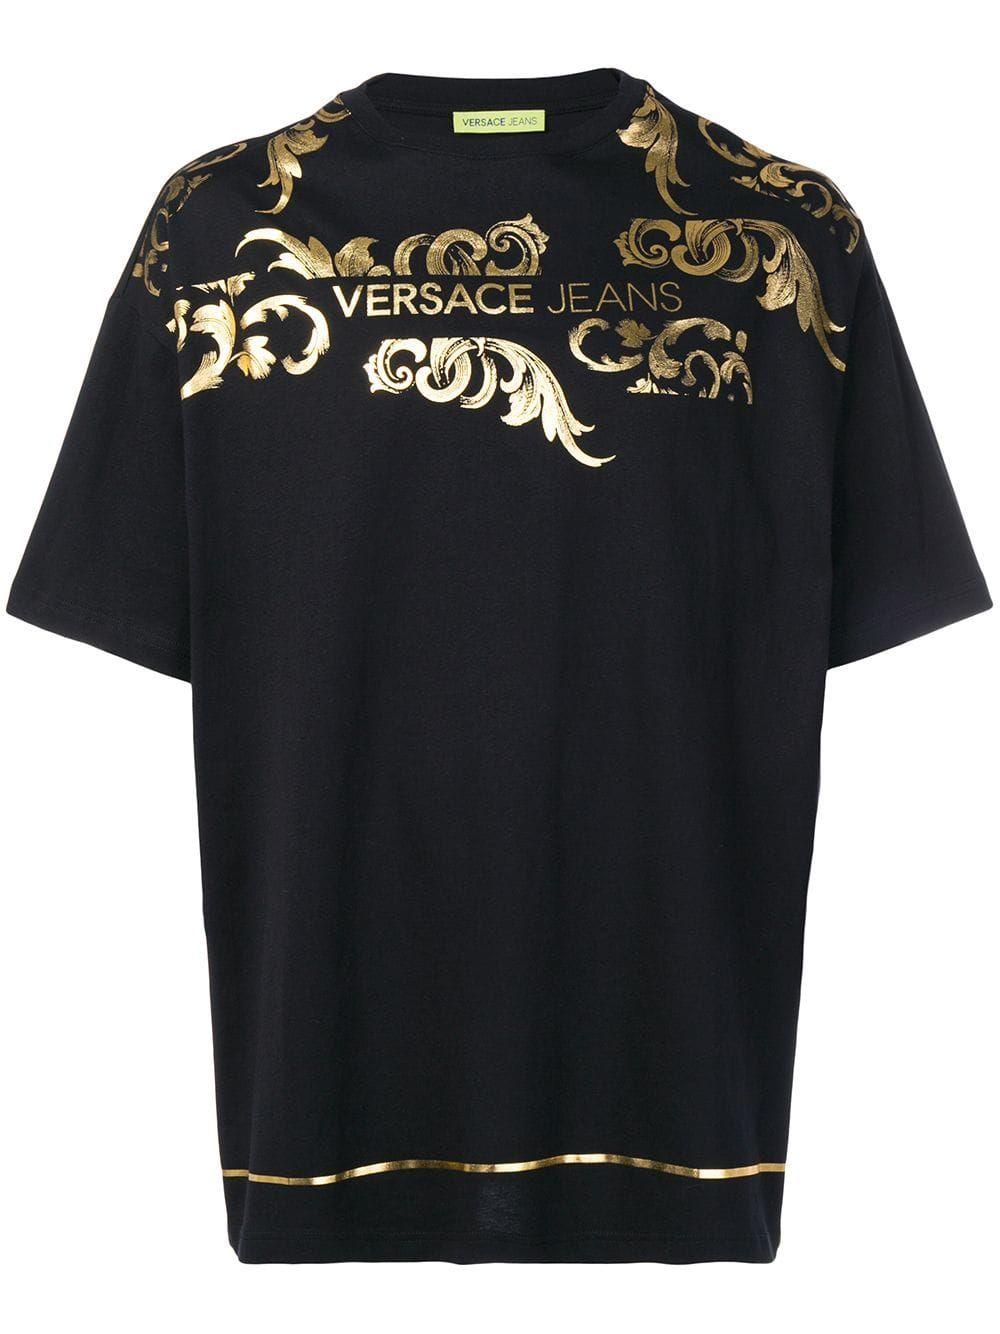 Versace Jeans Versace Jeans Baroque Print T Shirt Black Versacejeans Cloth Versace Jeans Versace Versace Jeans Couture